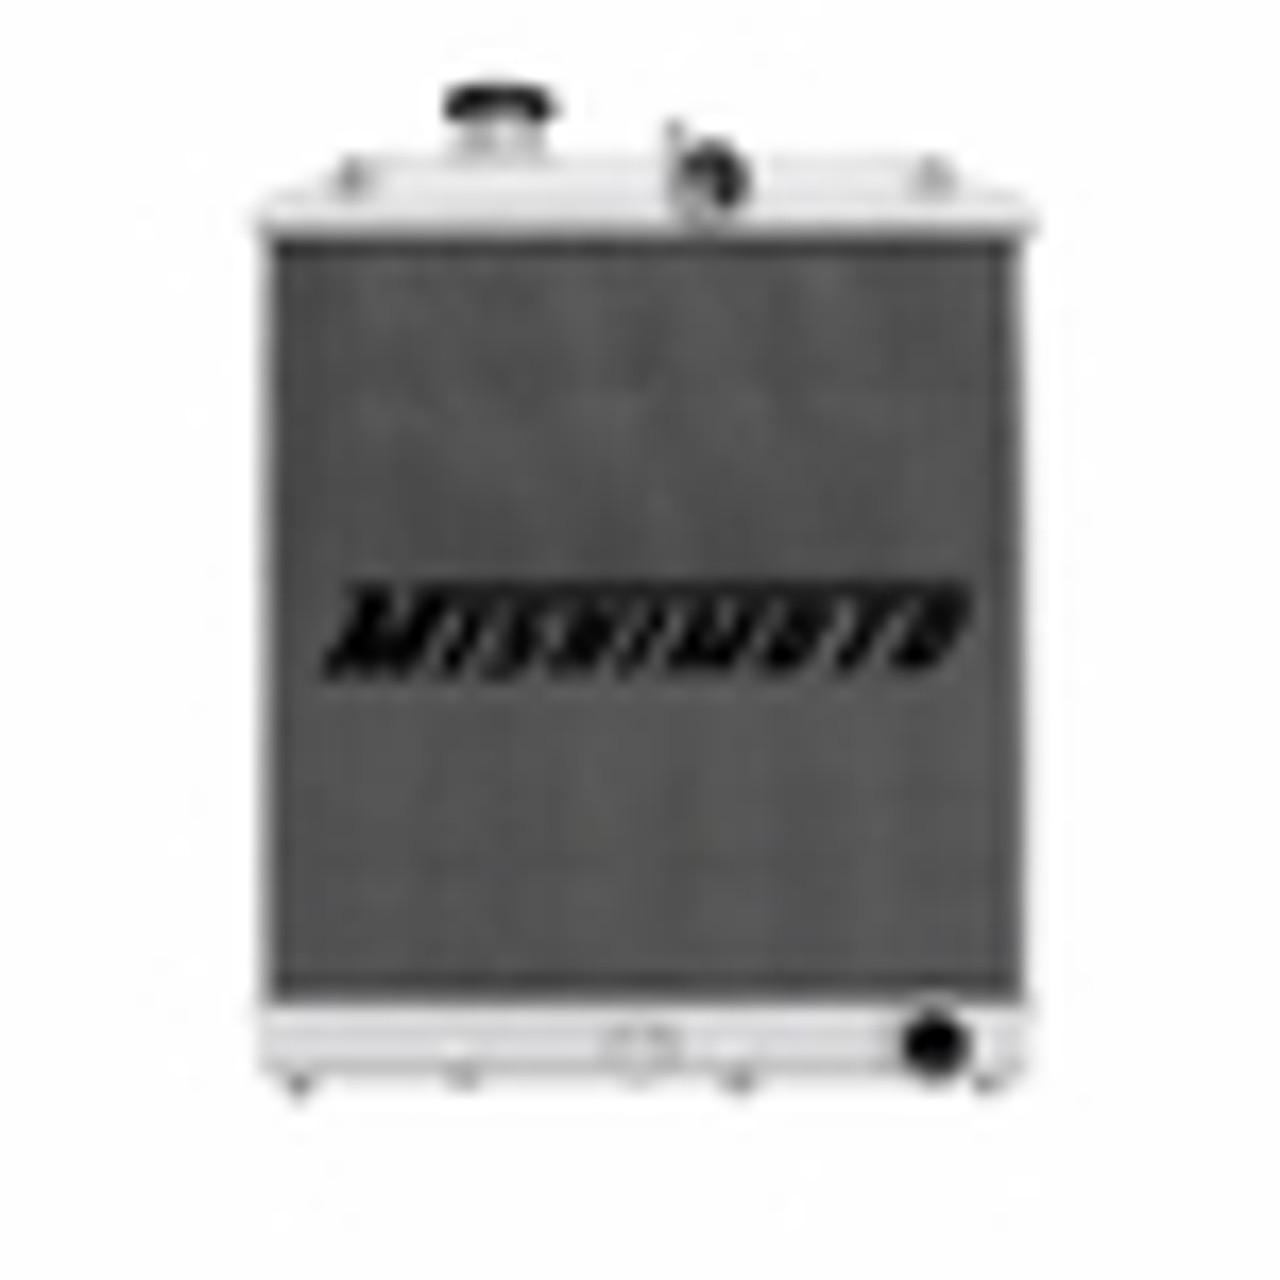 Mishimoto 92-00 Honda Civic / 93-97 Del Sol Manual X-LINE  Aluminum Radiator